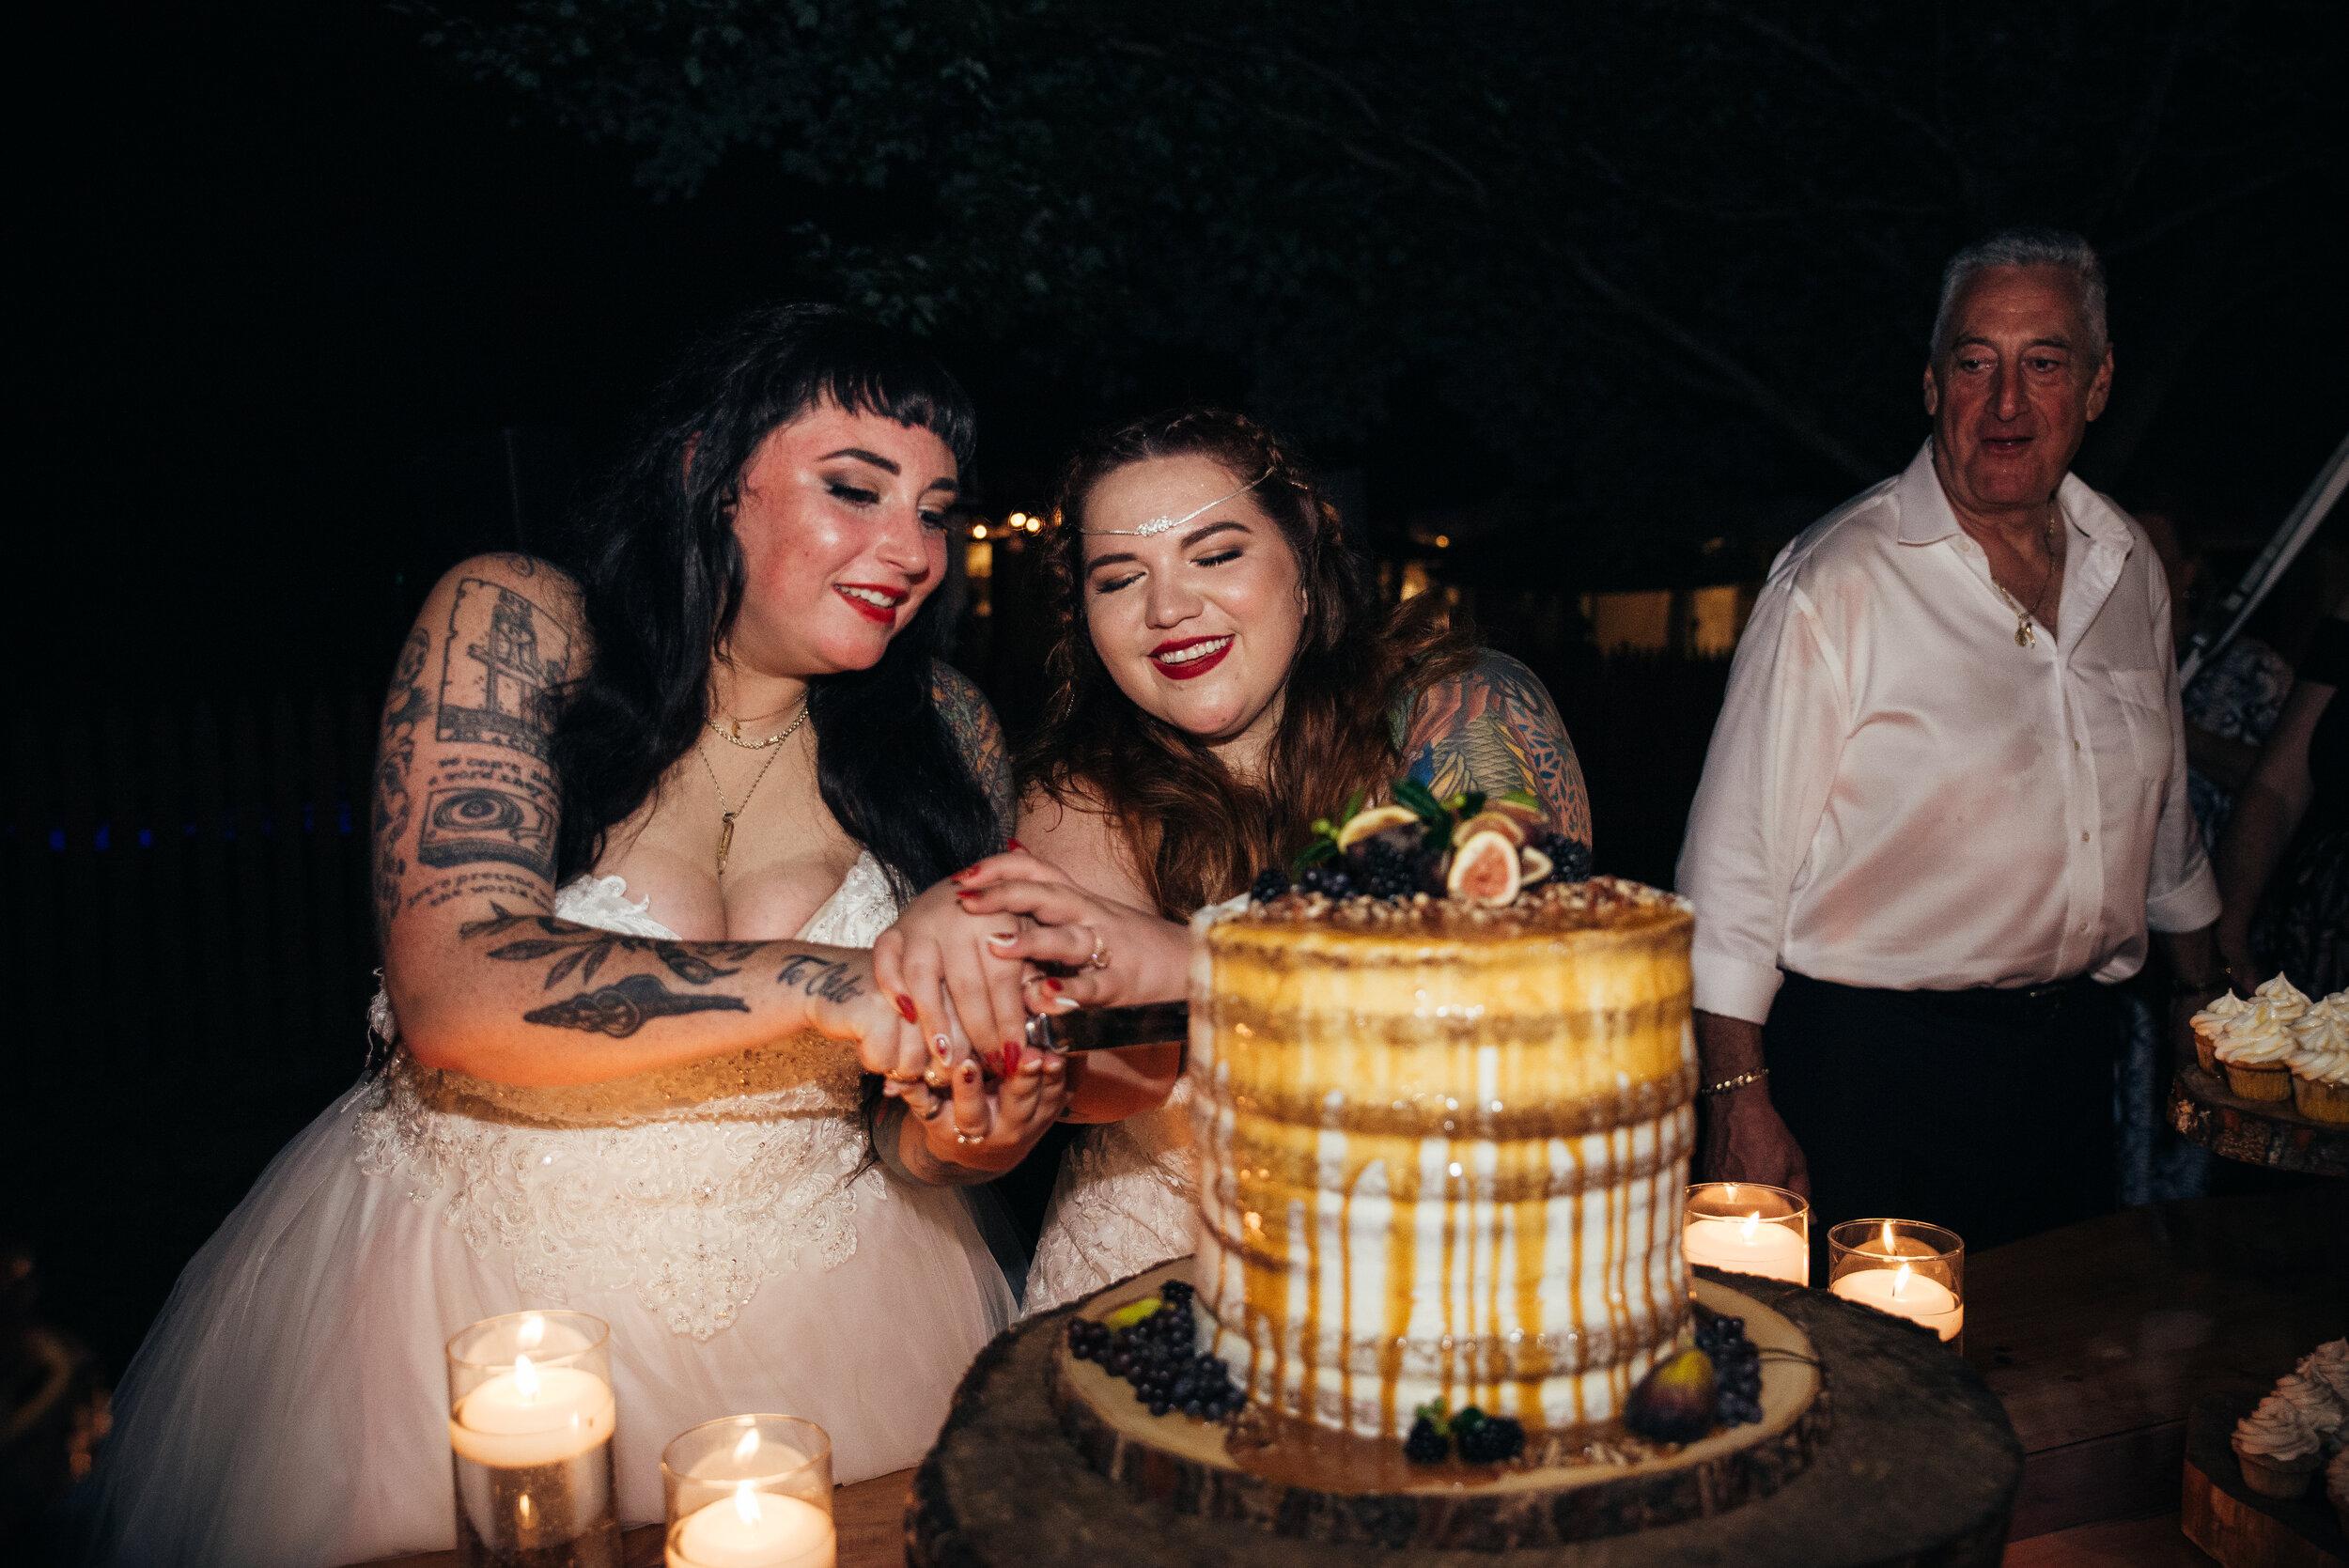 North Carolina LGBT Wedding - Raleigh LGBTQ Wedding Photographer - Apex Wedding Photographer - Durham LGBTQ Wedding Photographer